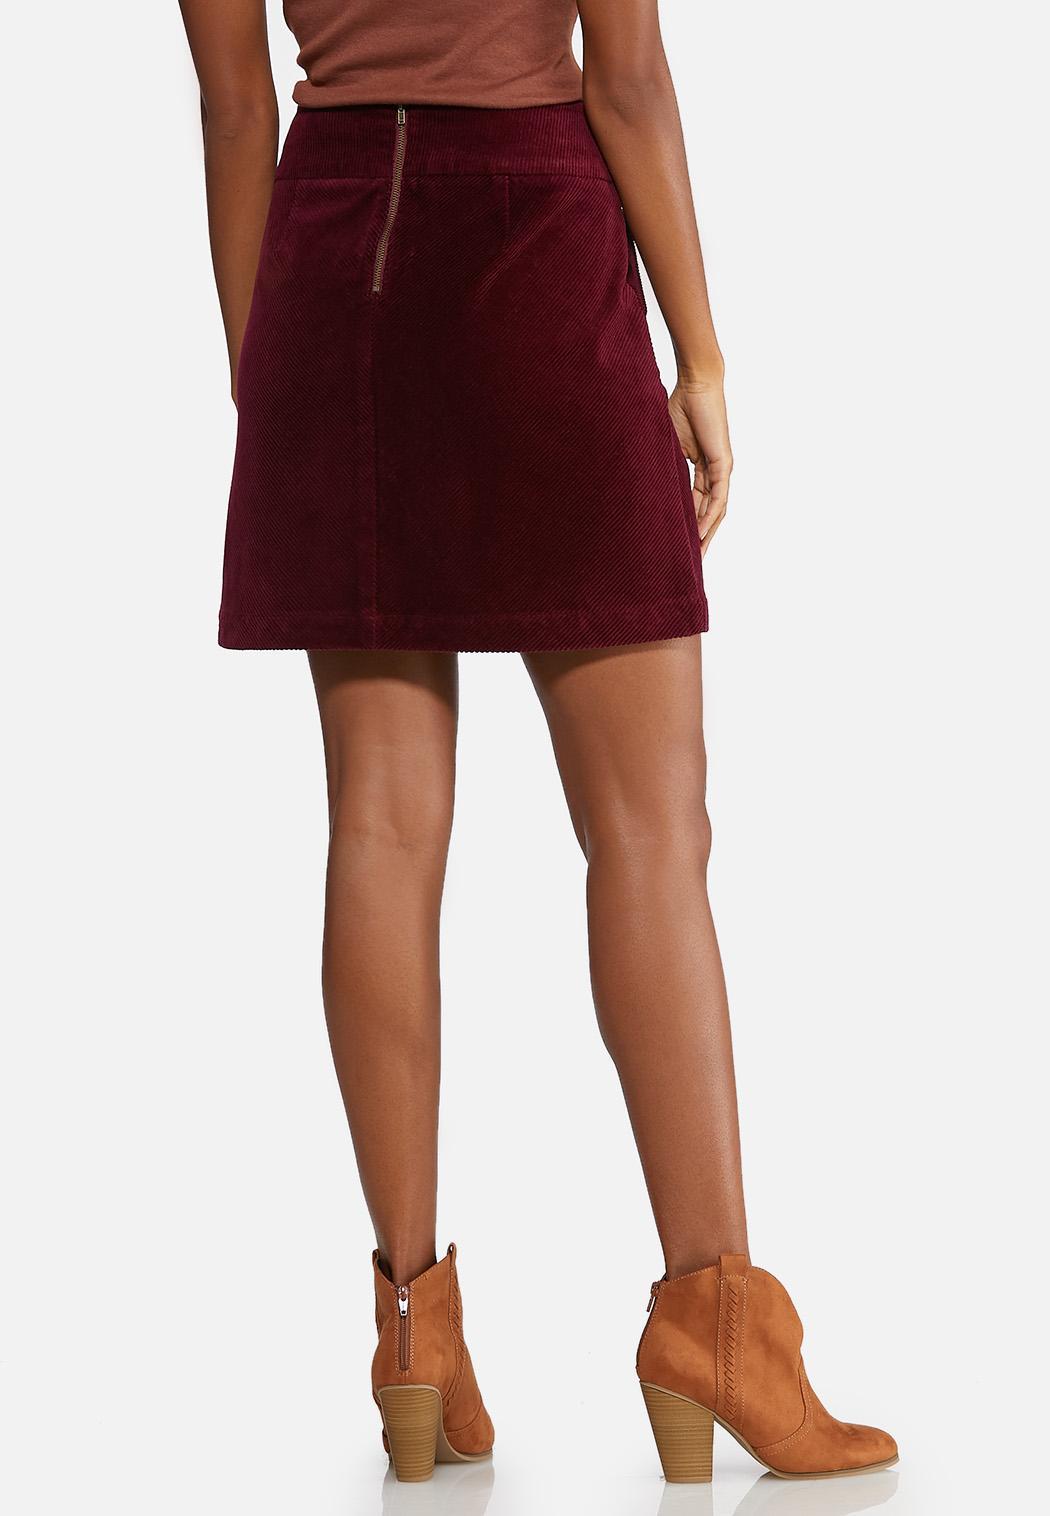 Corduroy Mini Skirt (Item #43993553)